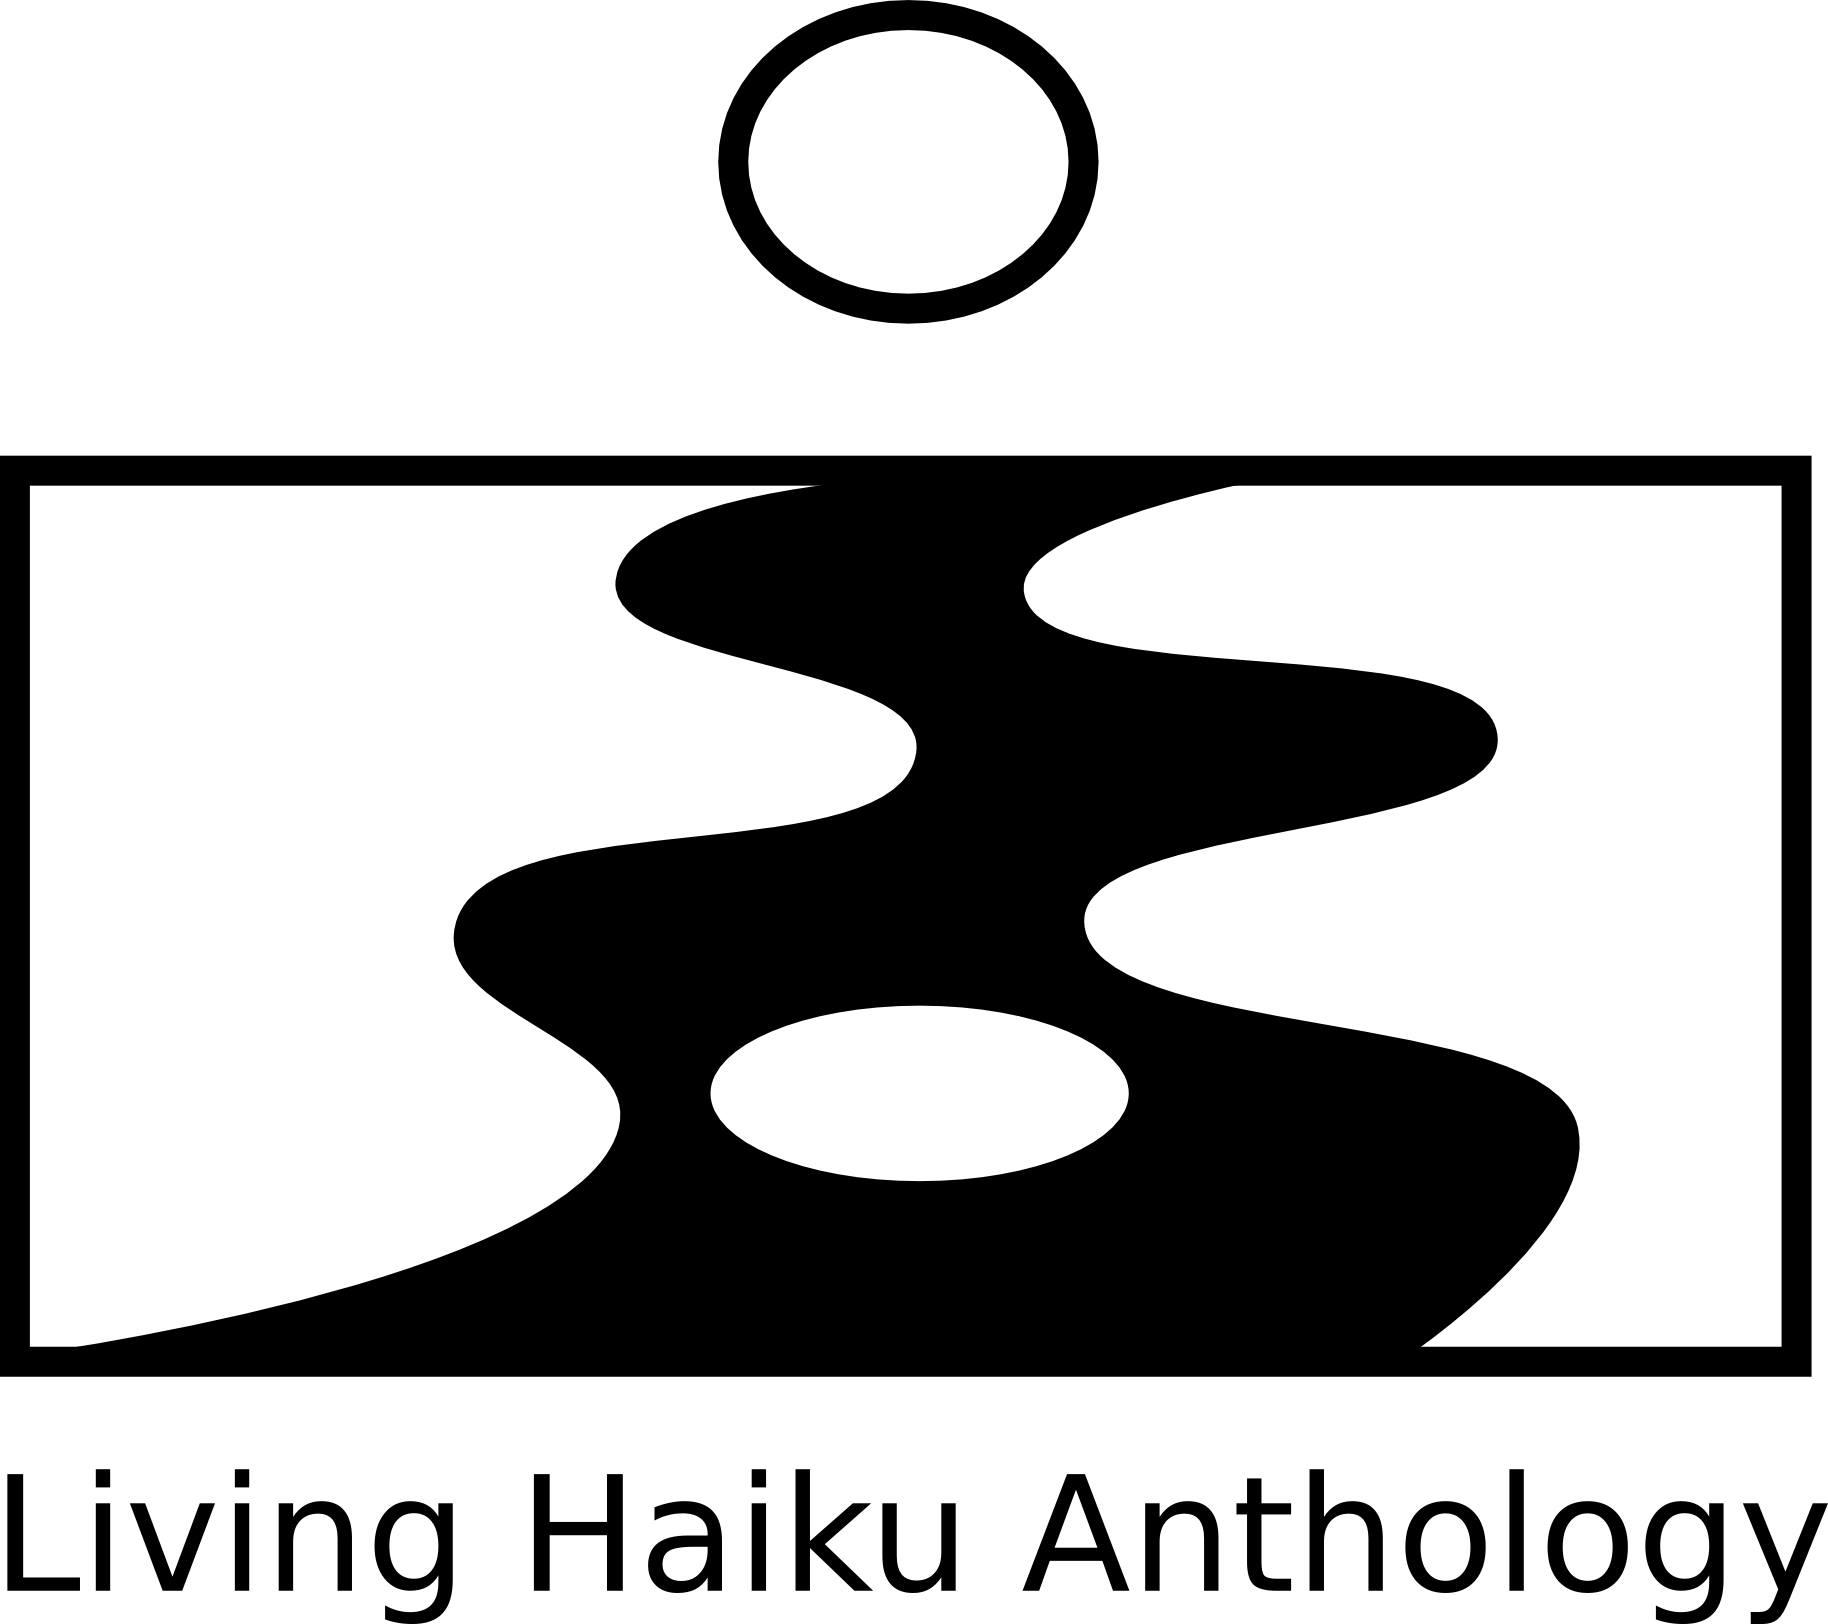 The Living Haiku Anthology.